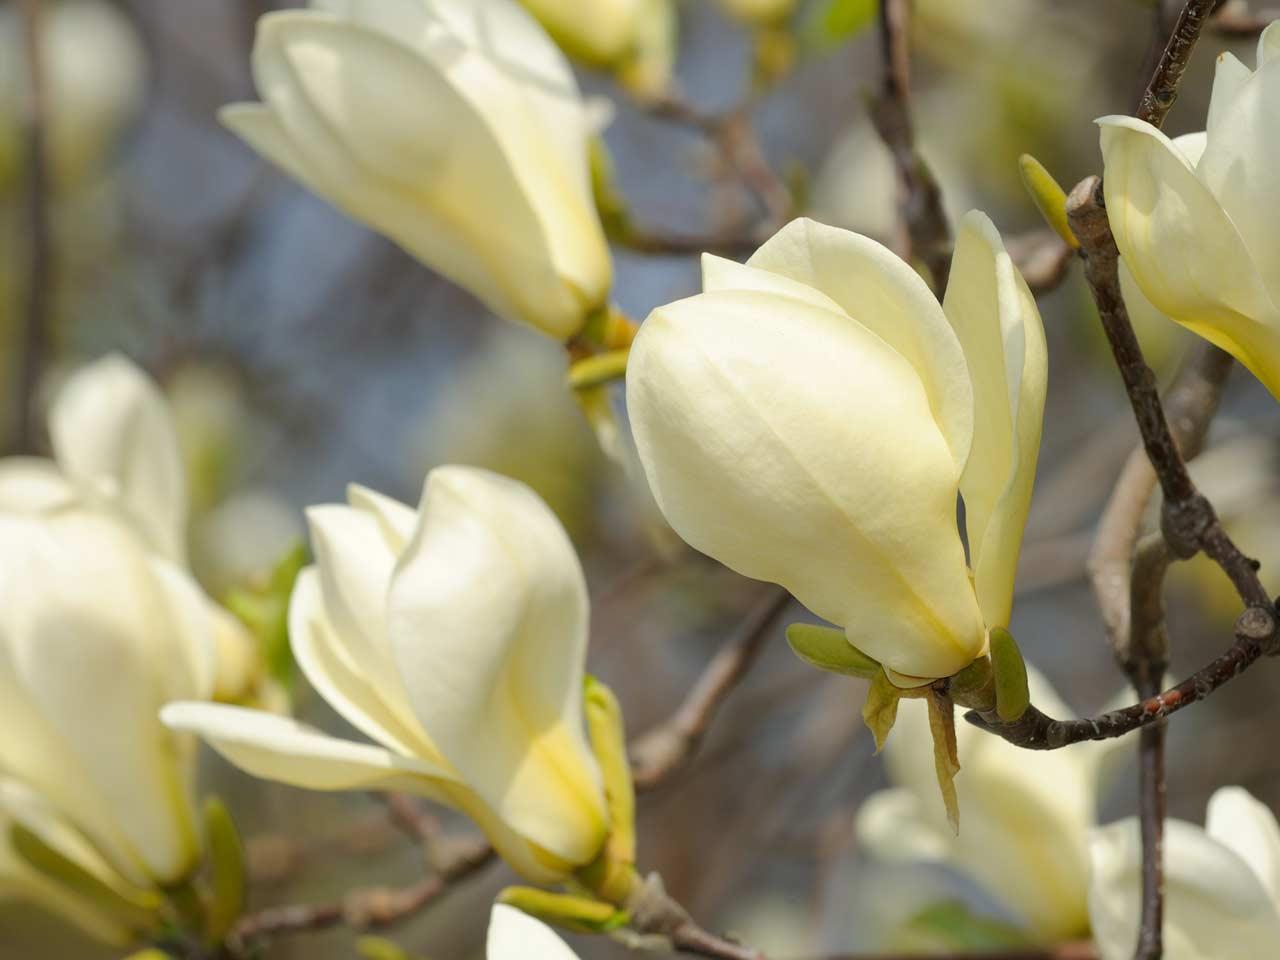 Magnolia culture mightylinksfo Gallery